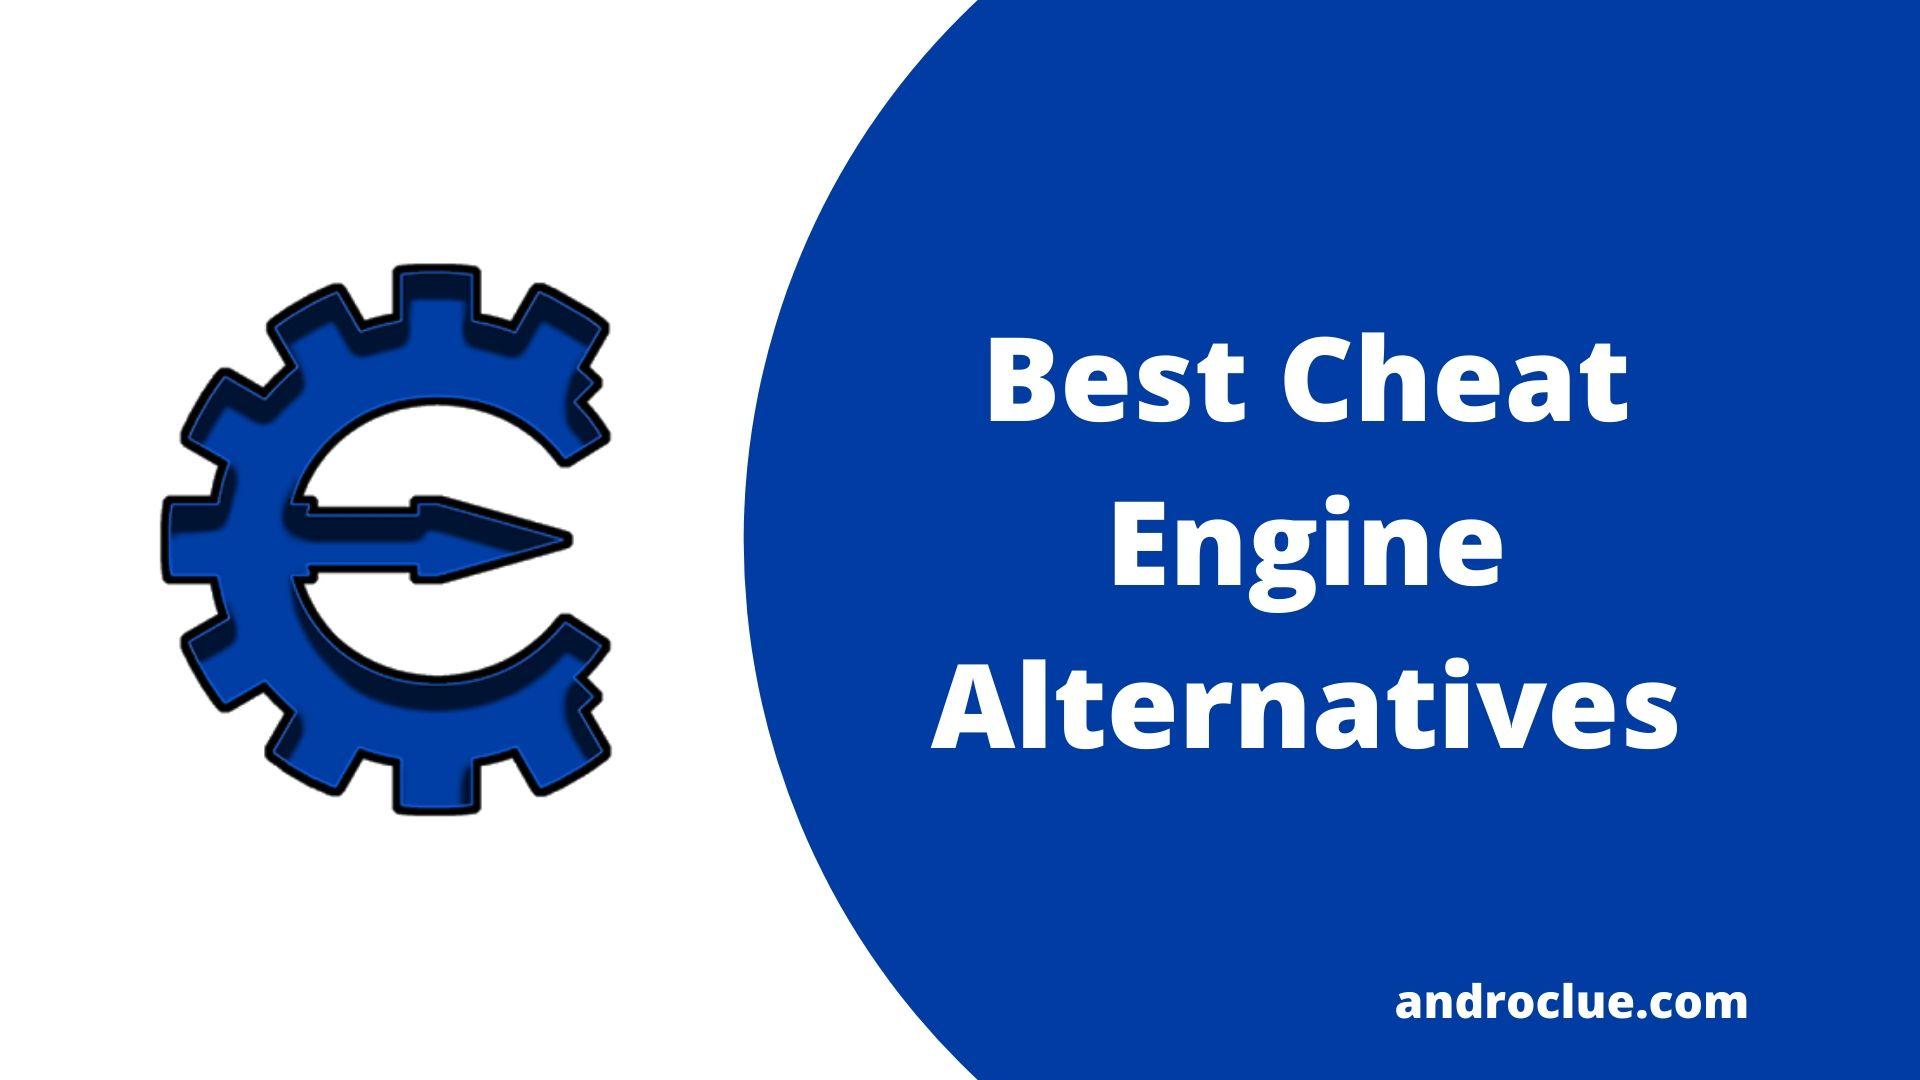 Cheat Engine Alternatives